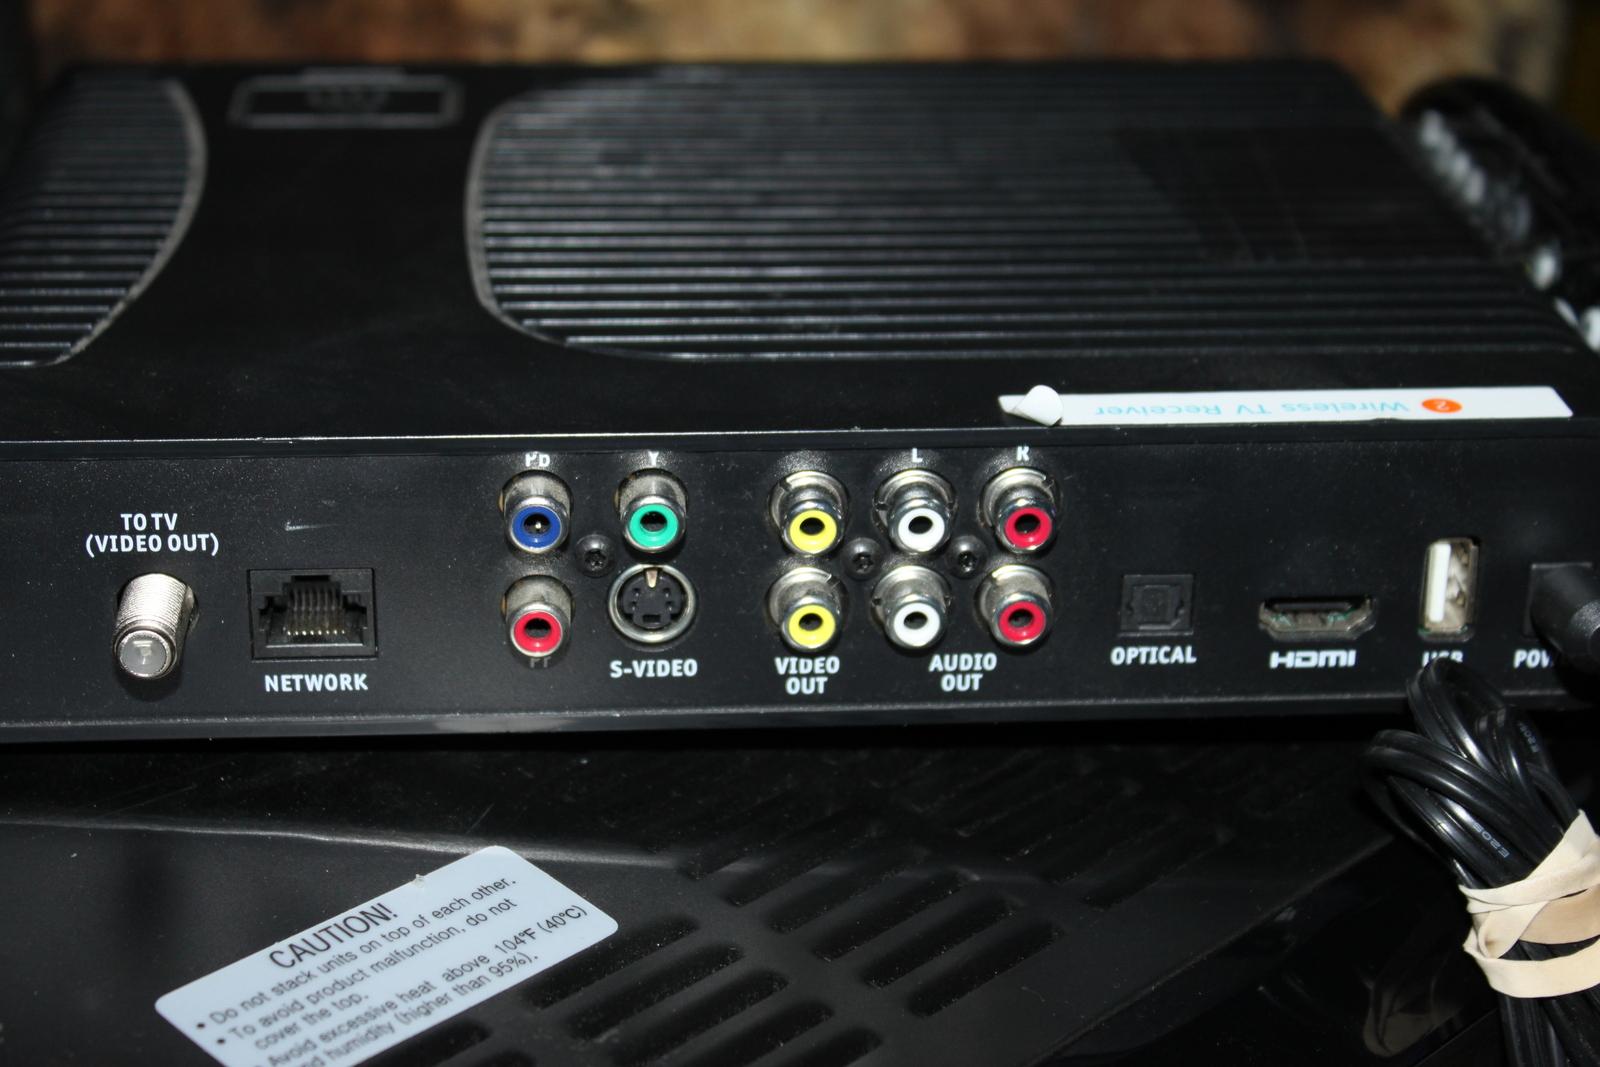 Att Uverse Wallpaper Wallpapersafari U Verse Box Wiring Diagram Cisco Tv Wireless Receiver Isb7005 Sdhd With Wifi 1600x1067